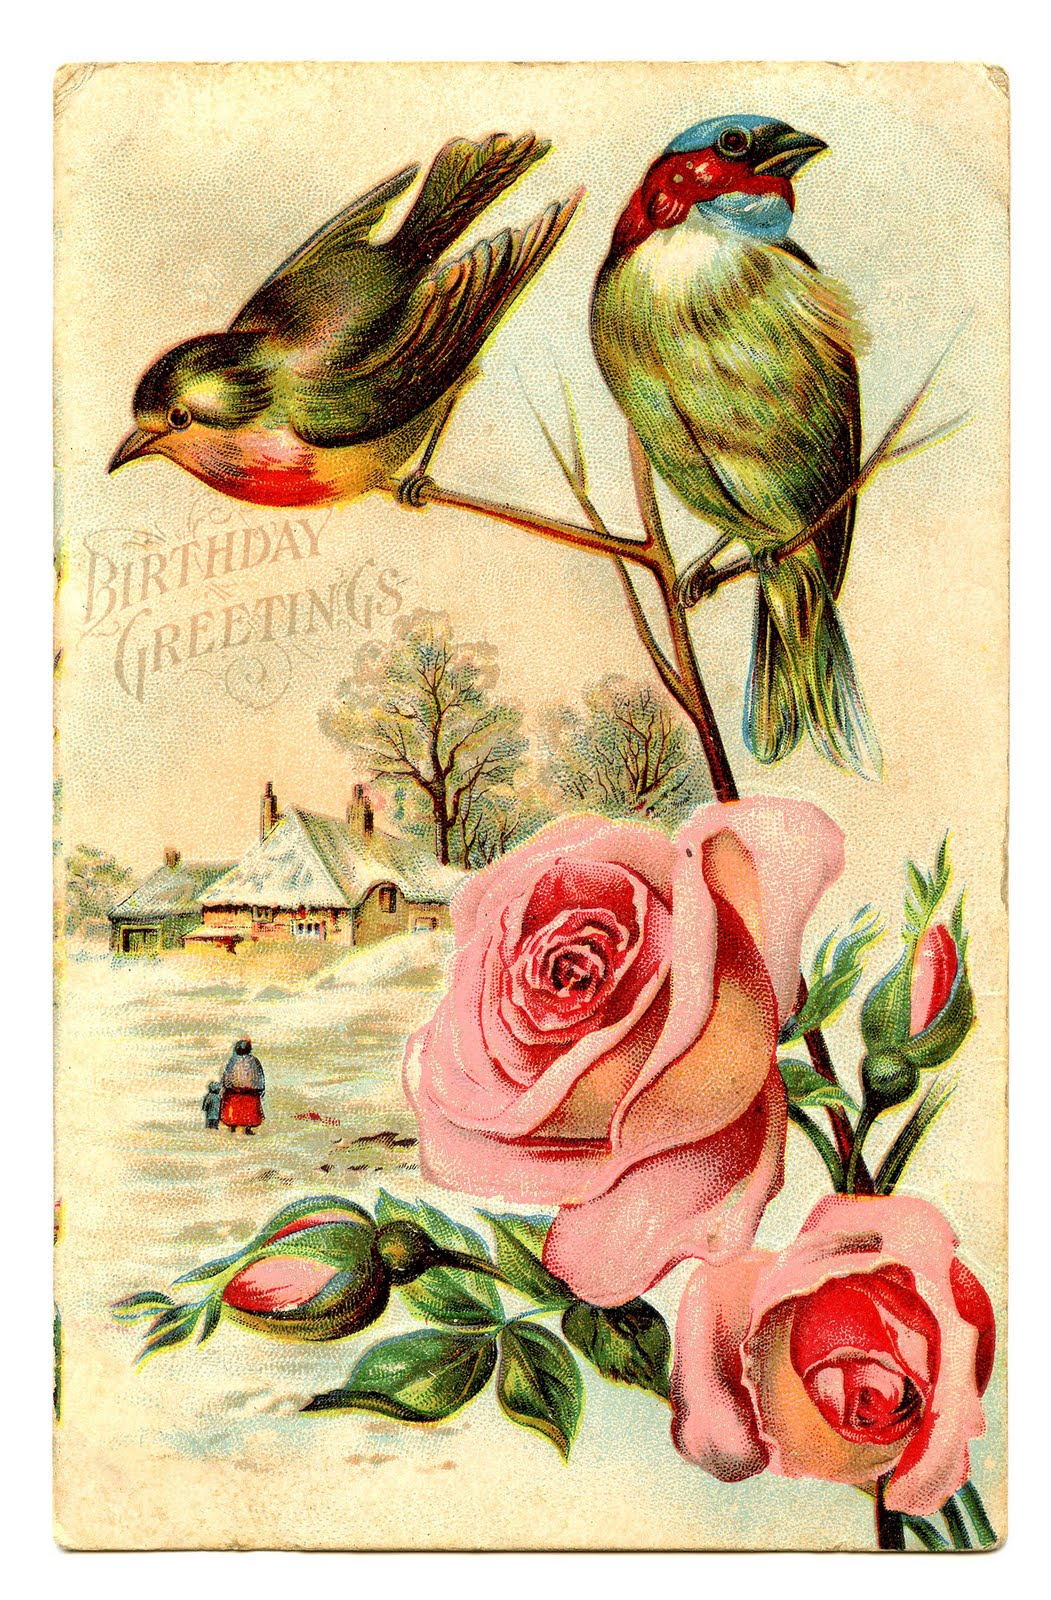 1000  ideas about Vintage Clip Art on Pinterest | Vintage tags, Ephemera and Vintage paper